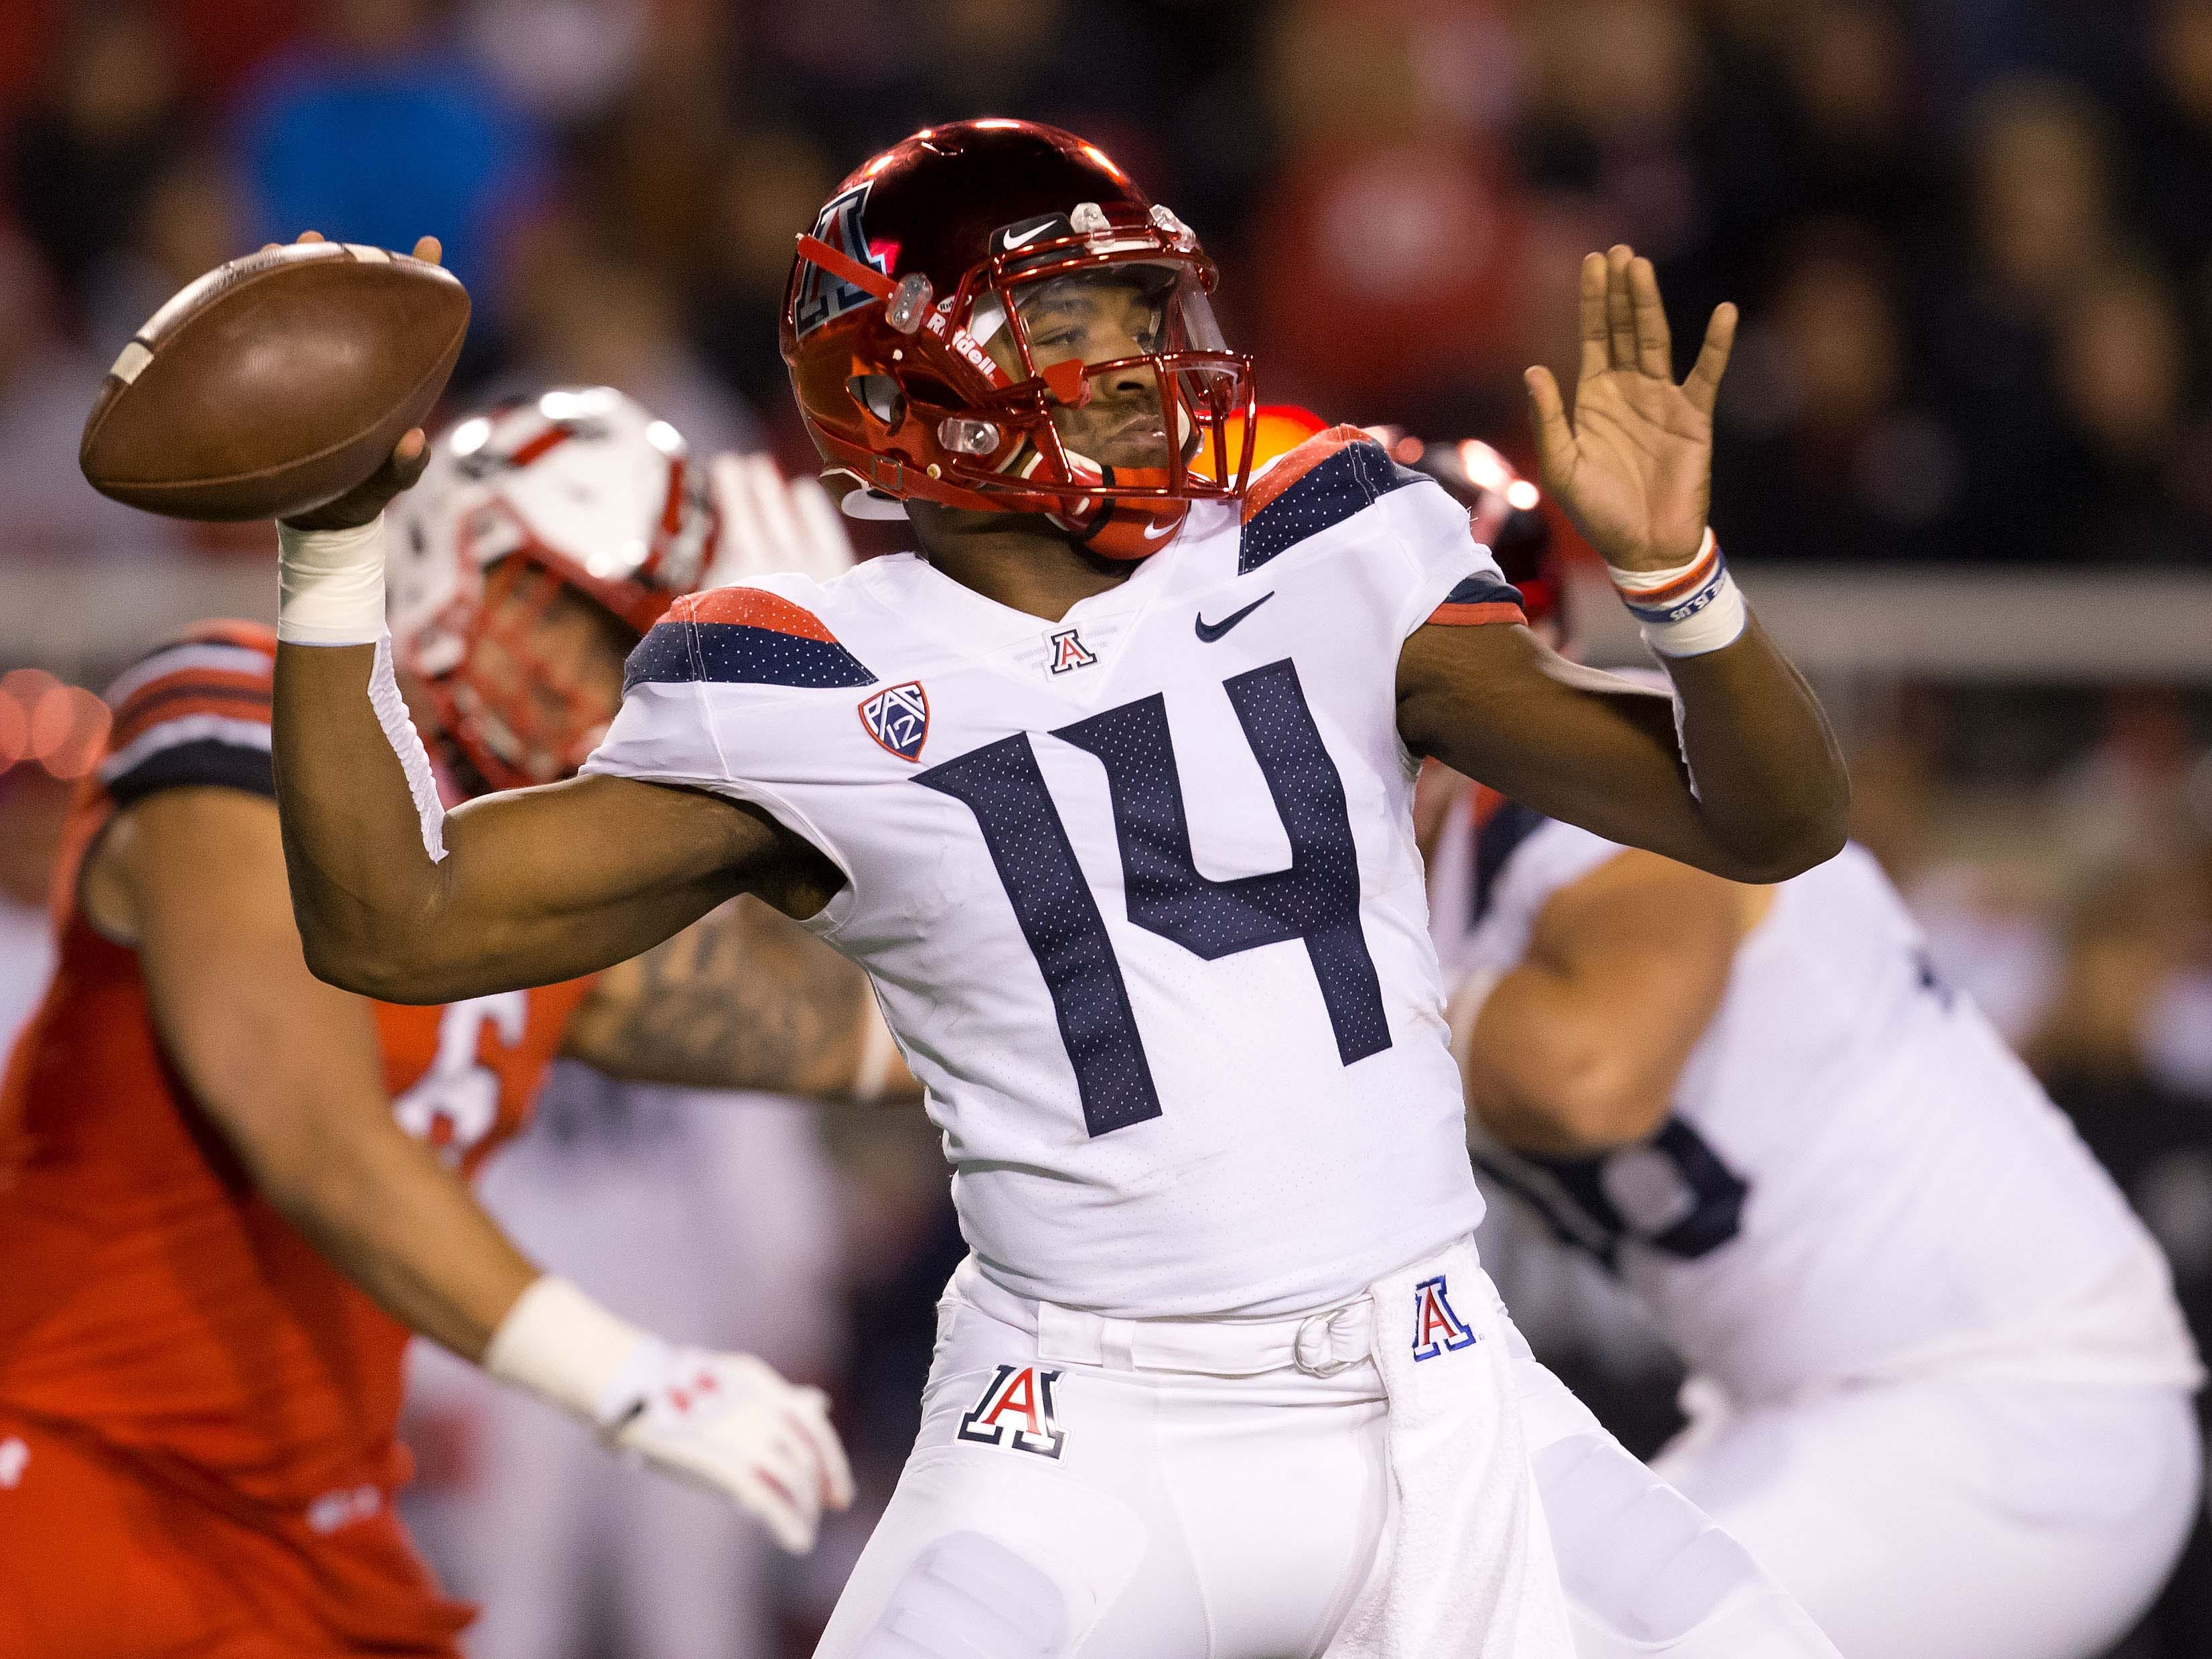 Oct 12, 2018; Salt Lake City, UT, USA; Arizona Wildcats quarterback Khalil Tate (14) passes the ball during the first quarter against the Utah Utes at Rice-Eccles Stadium.